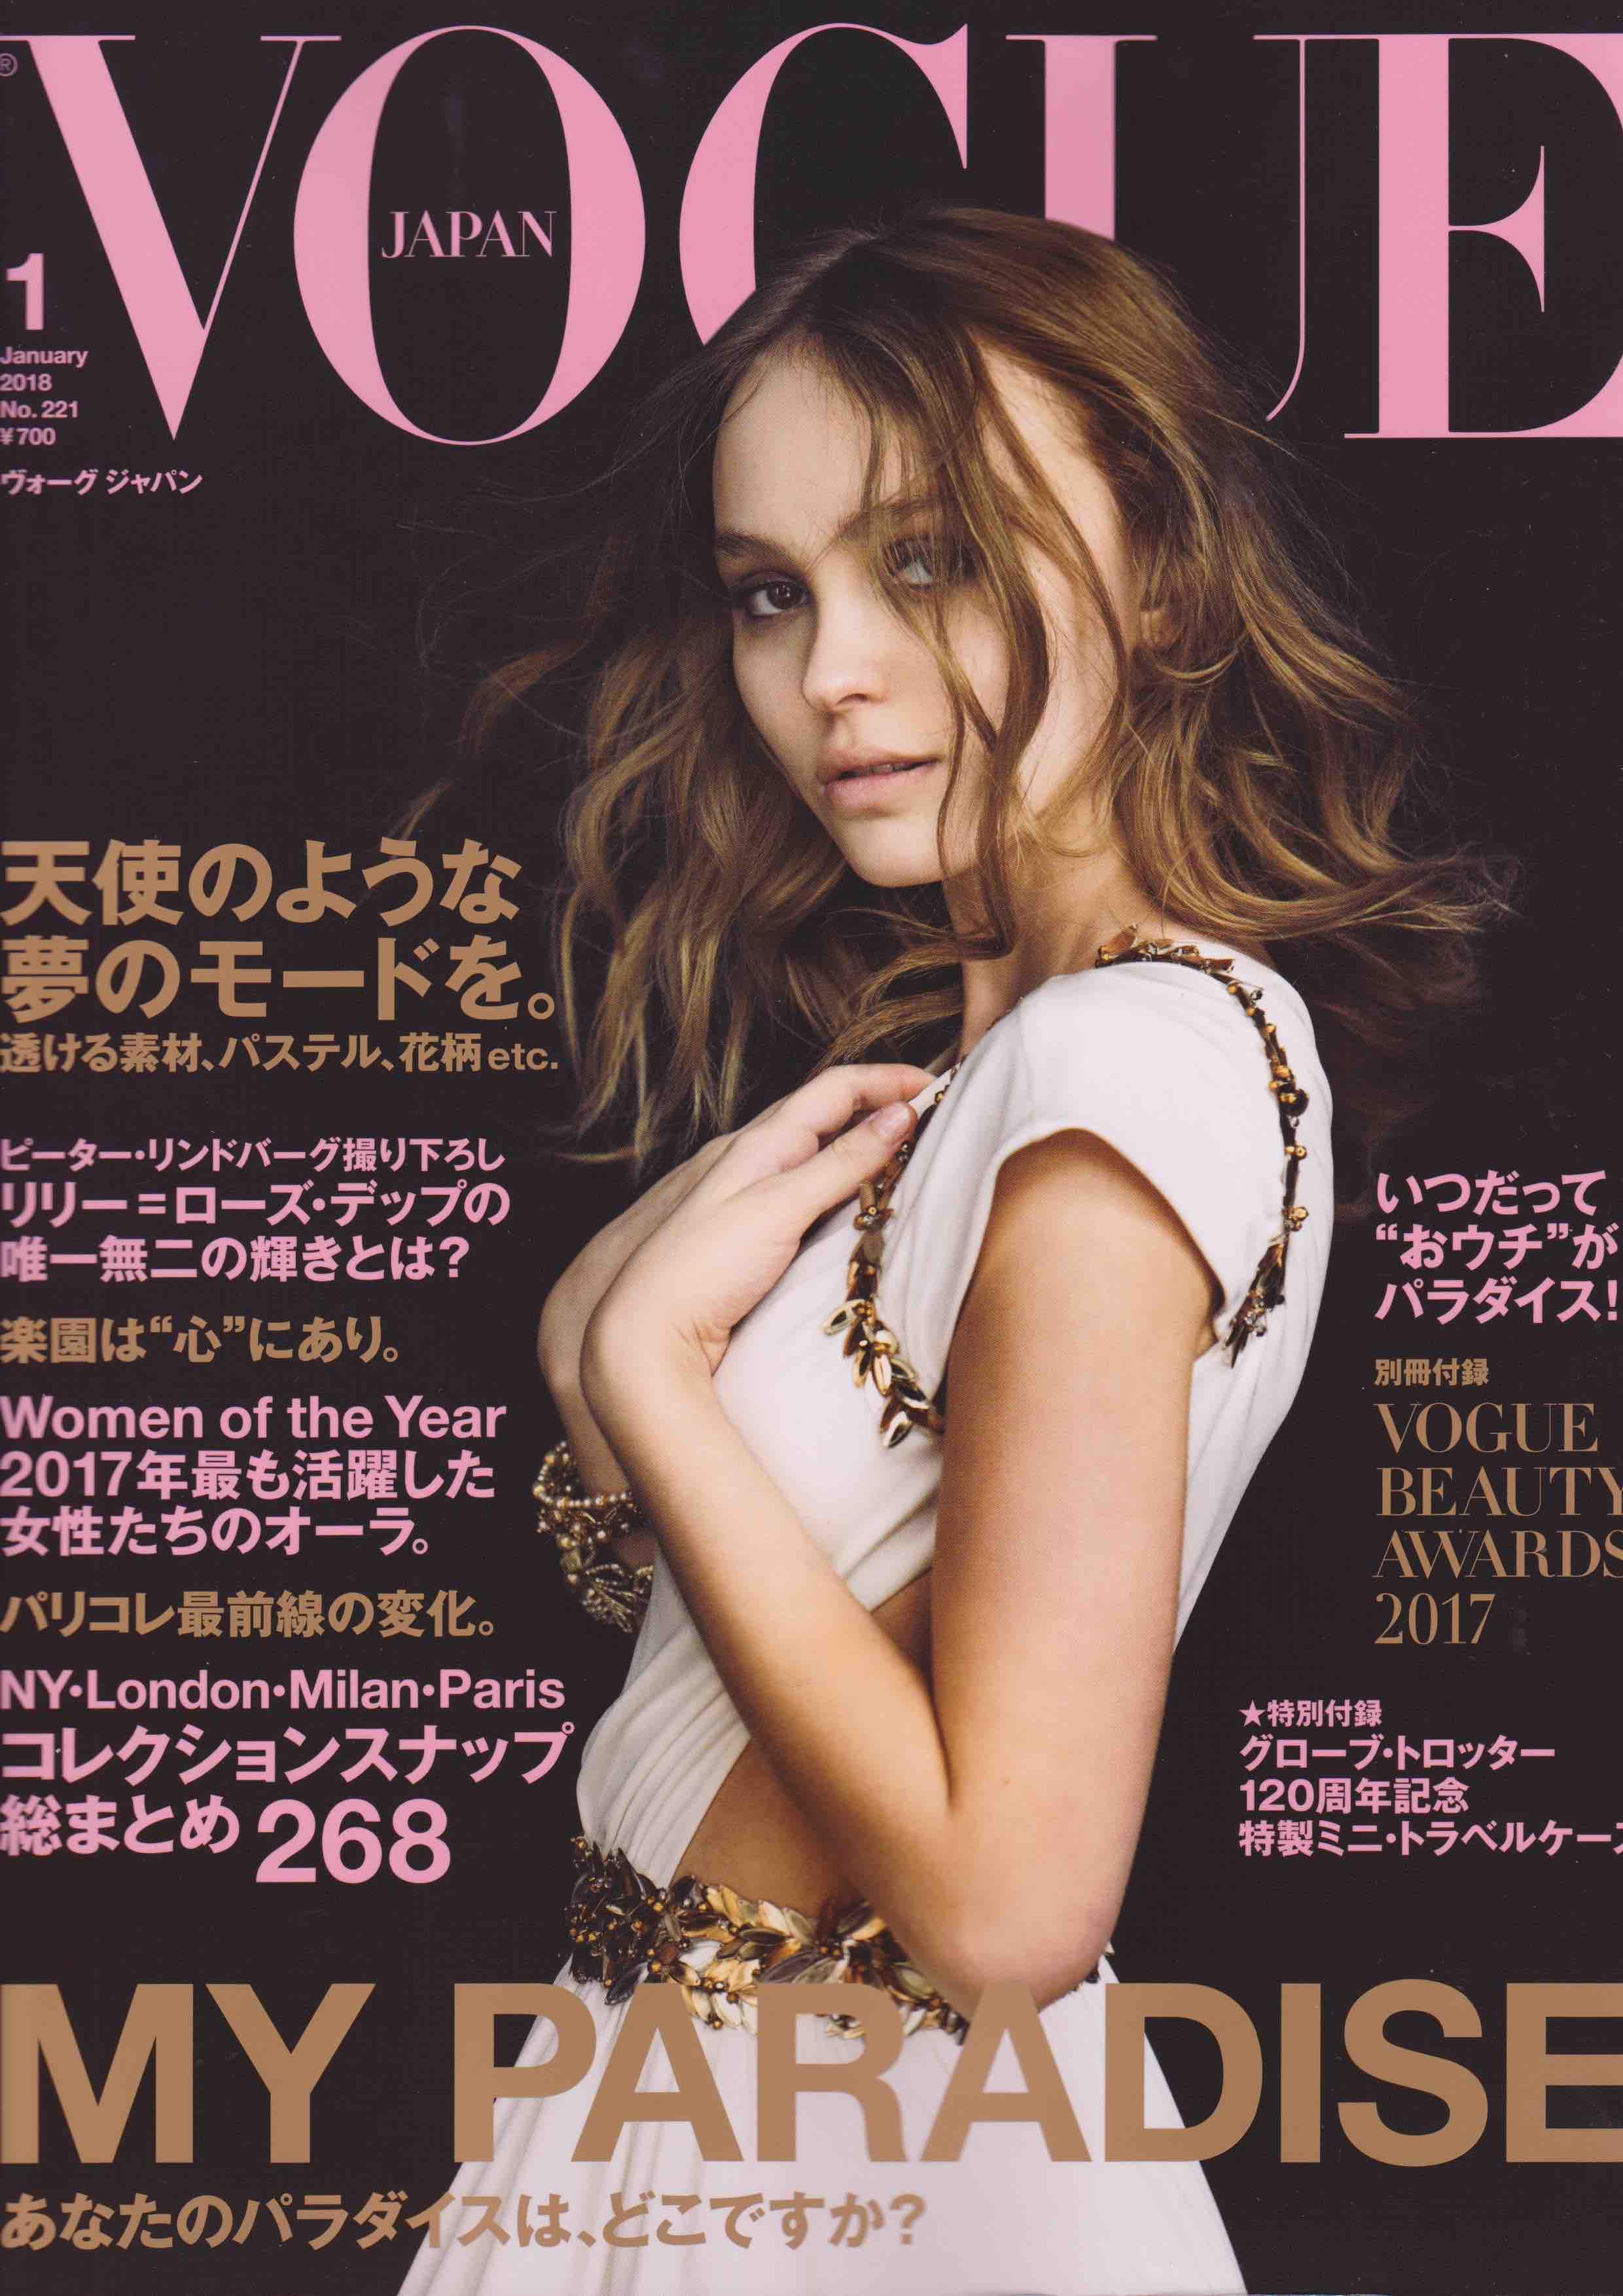 『VOGUE JAPAN』2018年1月号で瞑想とBODY MIND SPIRITが紹介されました。